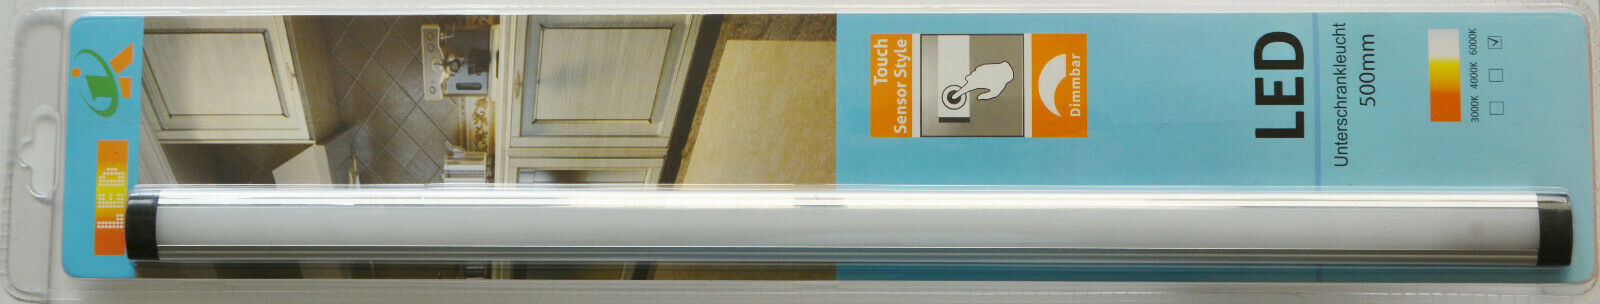 LED Unterschrankleuchte Touch Infrarot Sensor Dimmbar Lampe Küche Schrank